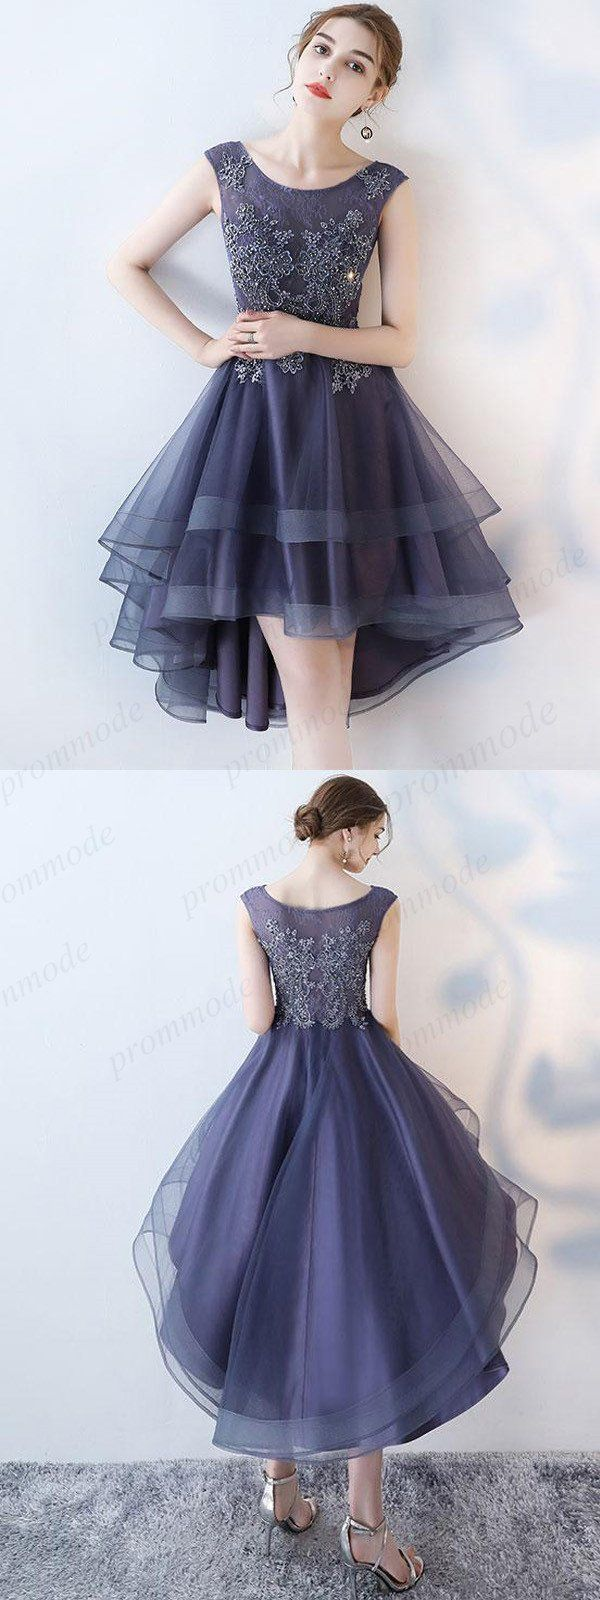 Purple Hi-lo Beaded Lace Homecoming Dresses,Unique Short Prom Dresses,BDY0215 1